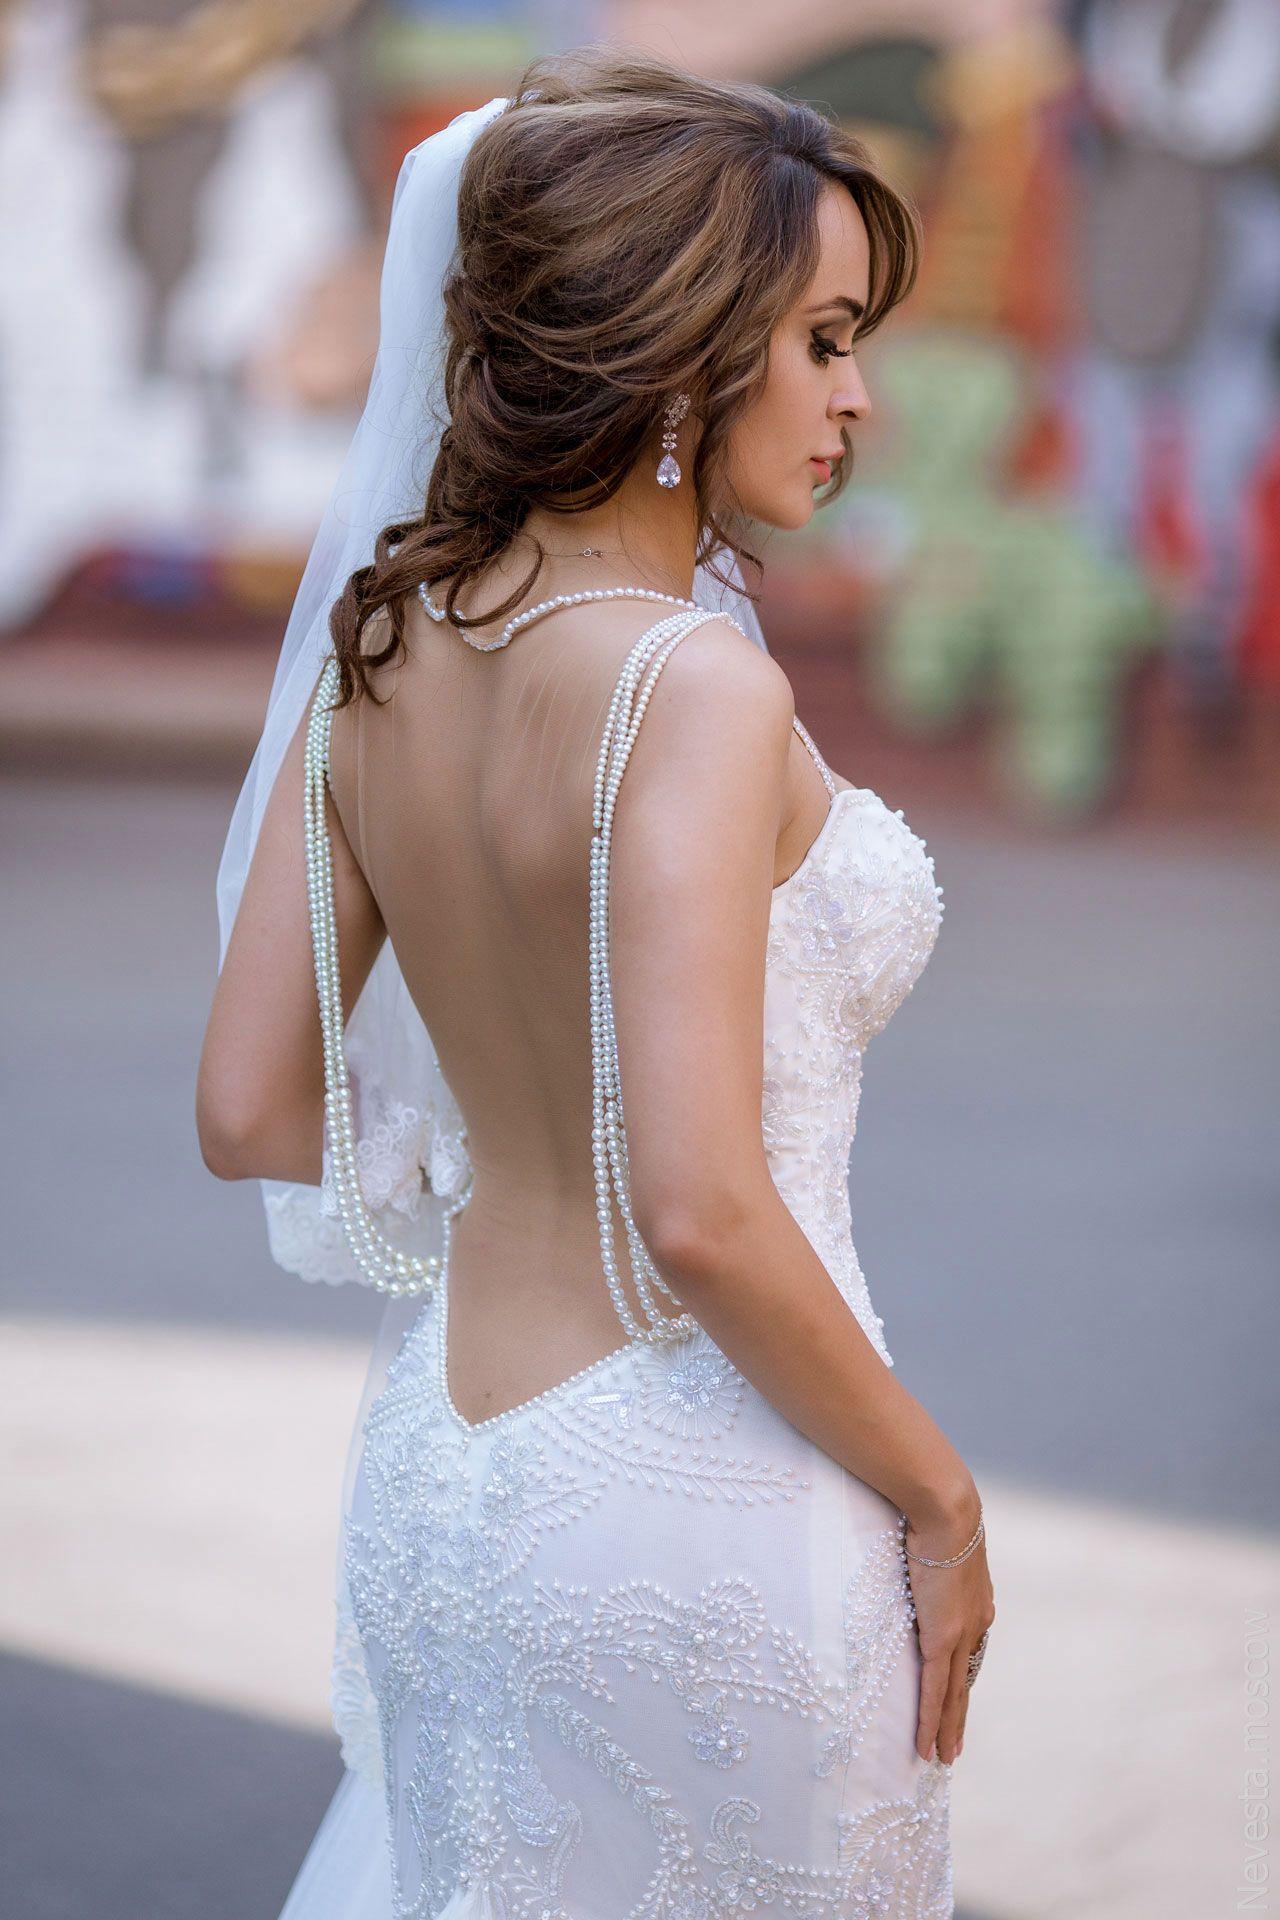 Актриса Анна Калашникова в образе белого лебедя фото 29